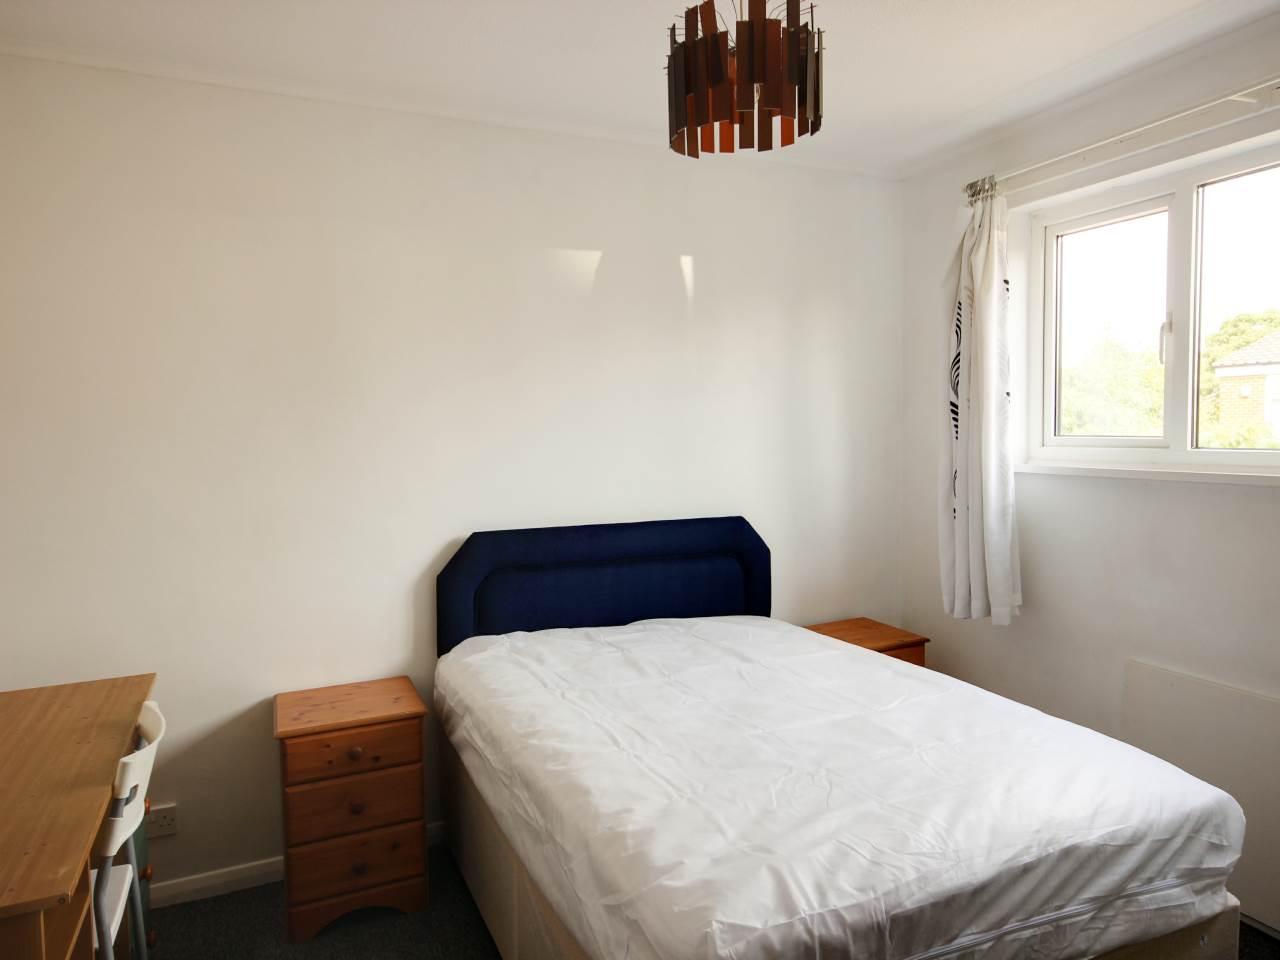 4 Bedroom House To Rent Drovers Way Hatfield Birchwood